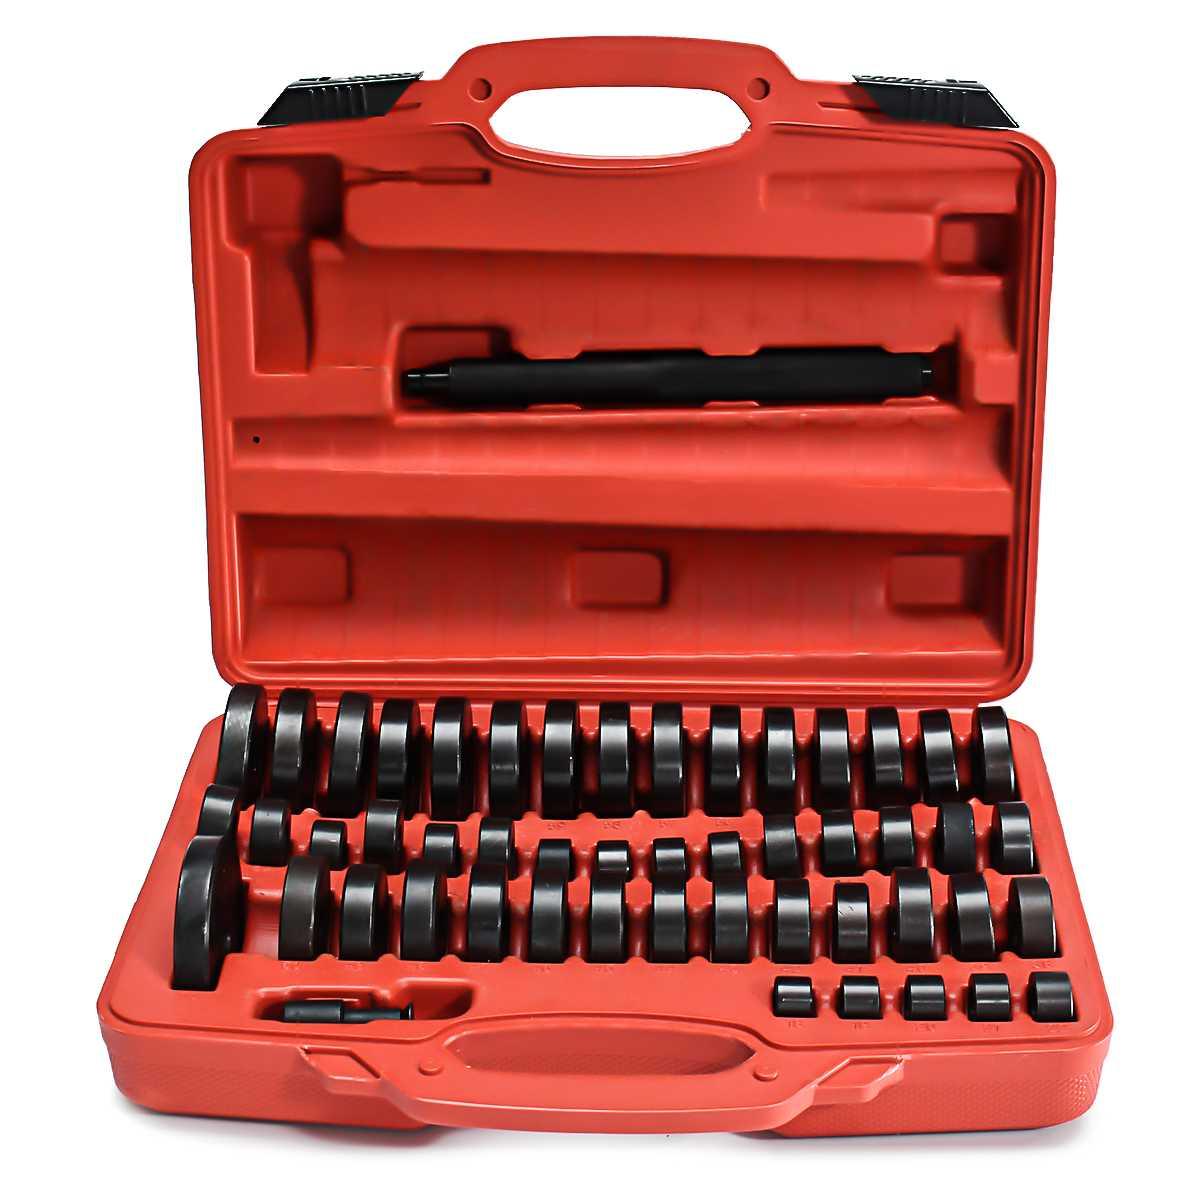 51Pcs/set Bearing Seal Driver Push Press Disc Tool for Car Repair Made of Special Carbon Steel